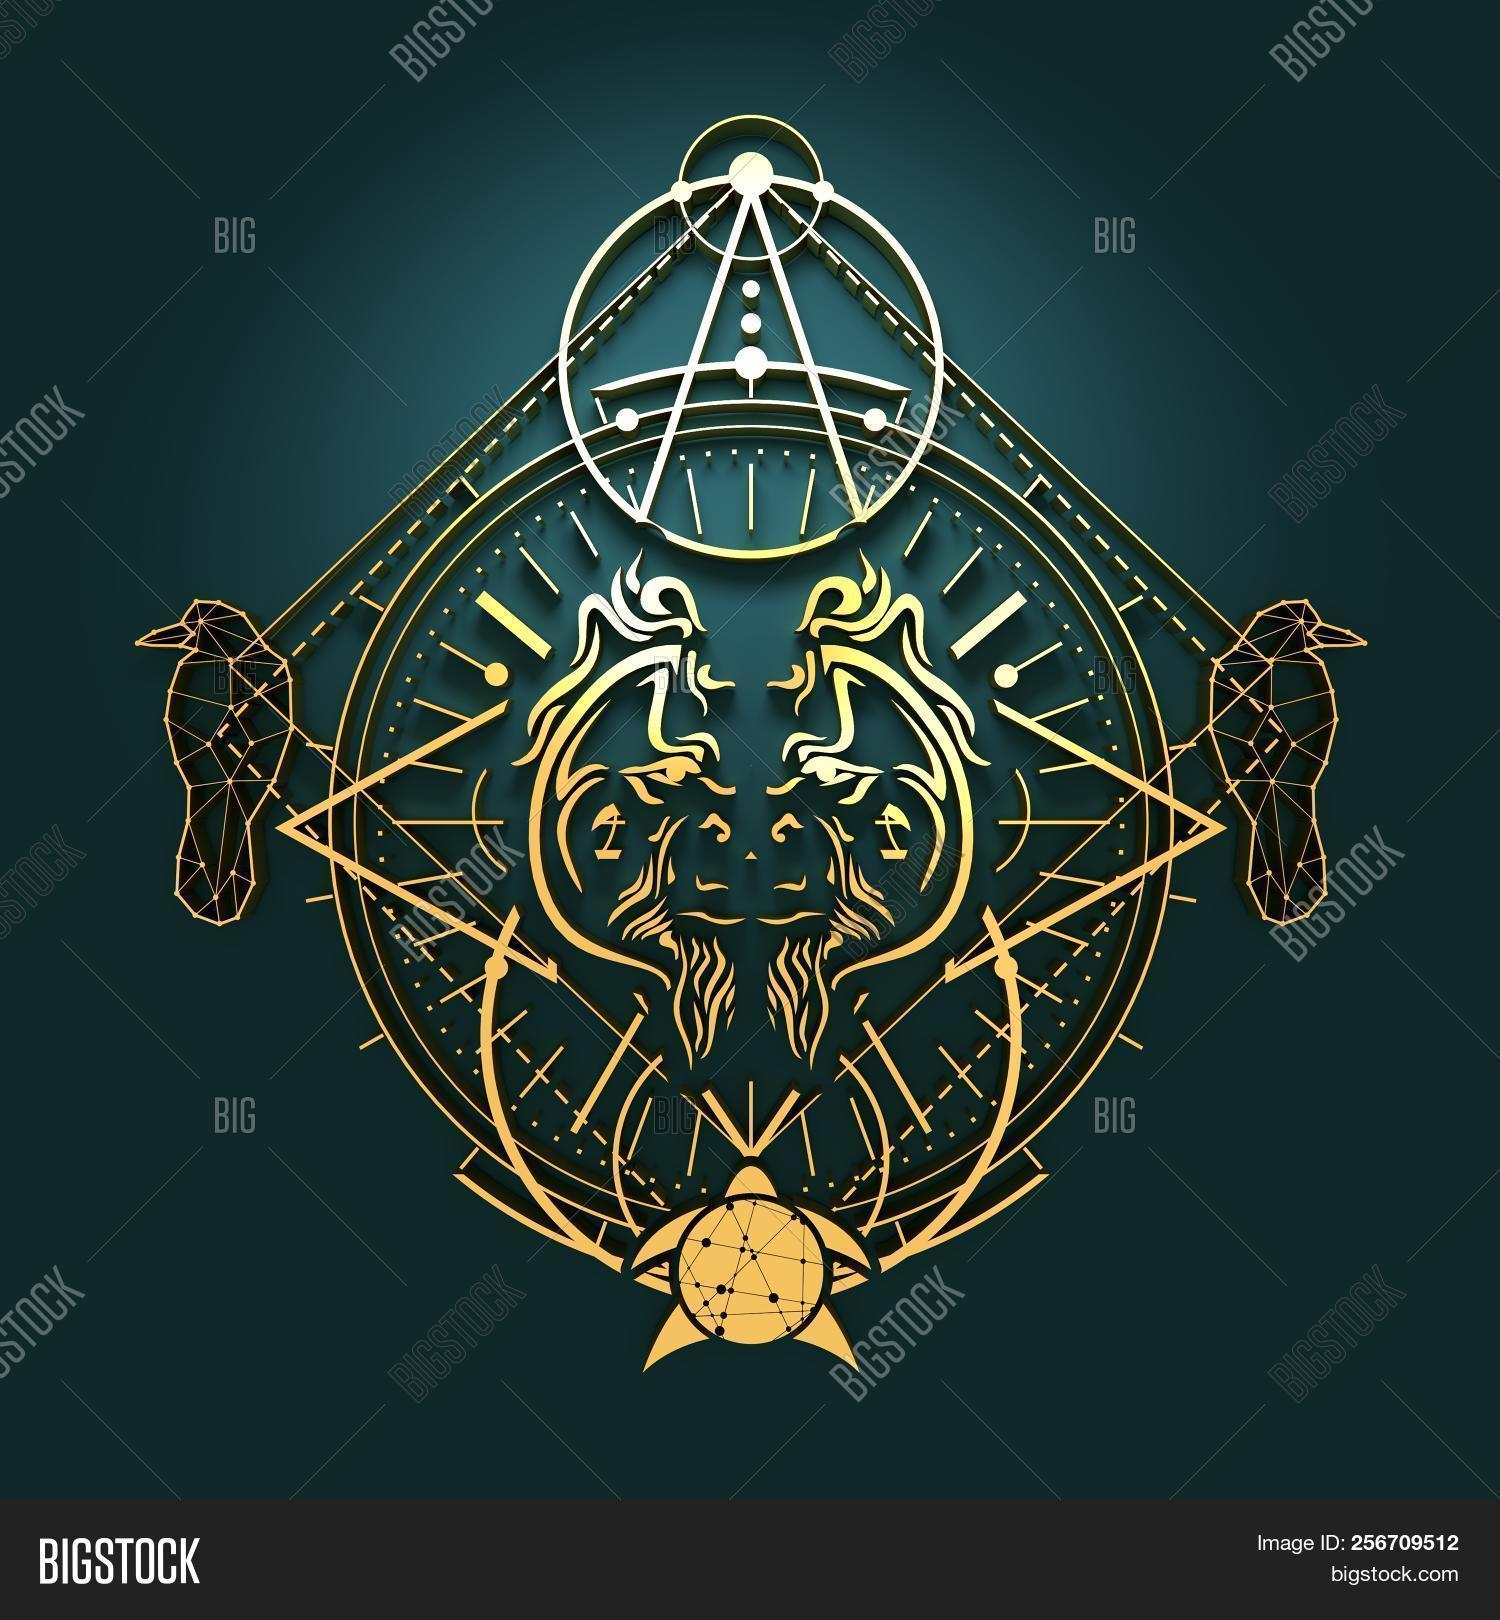 Mystical Symbol Image Photo Free Trial Bigstock